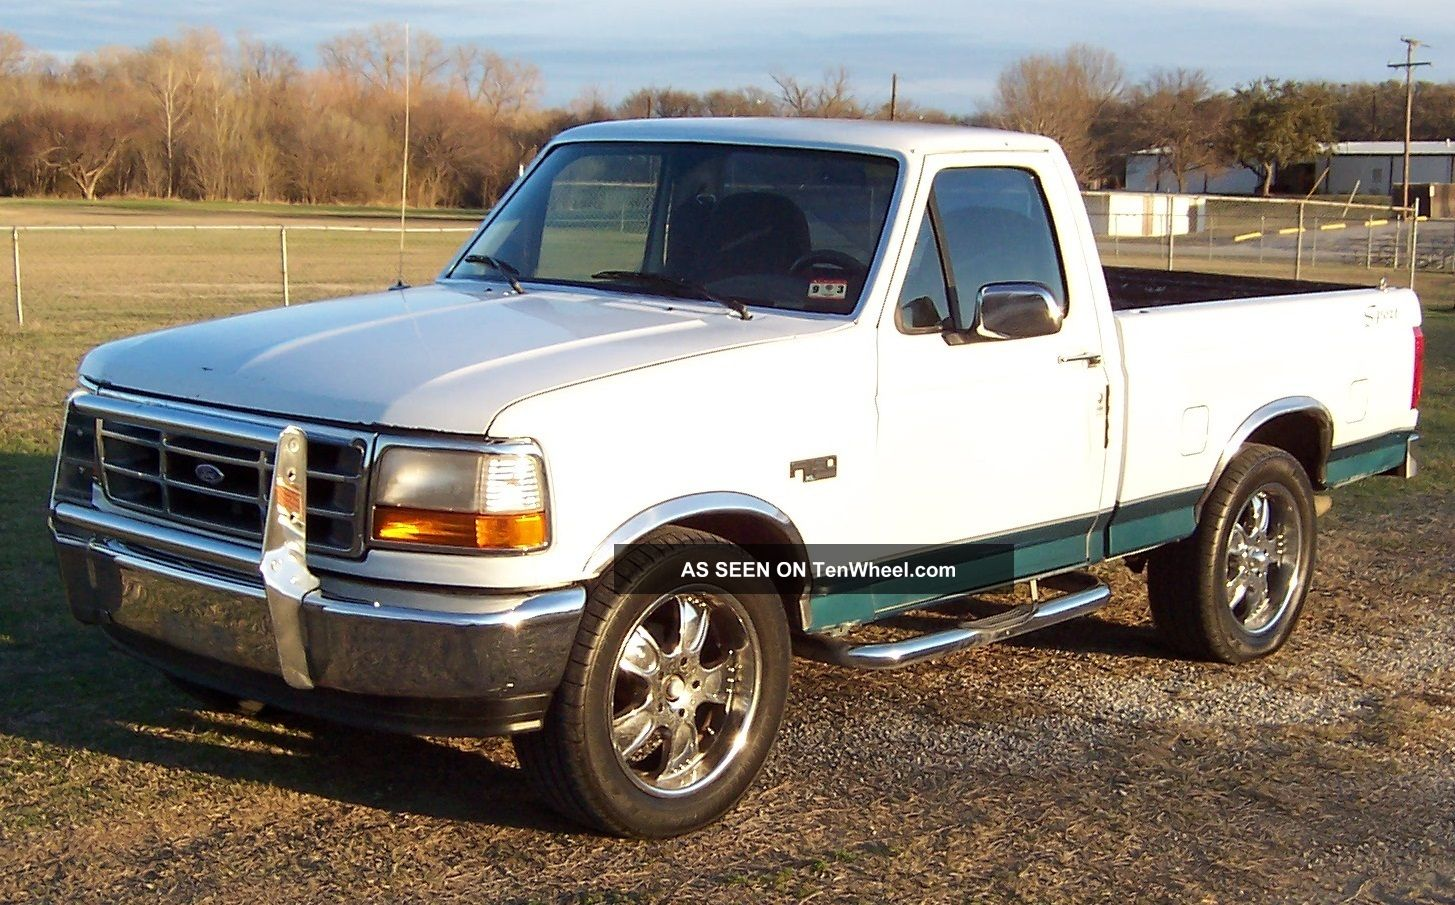 150 20 rims 1996 ford f150 xl short bed regular cab 20 inch wheels